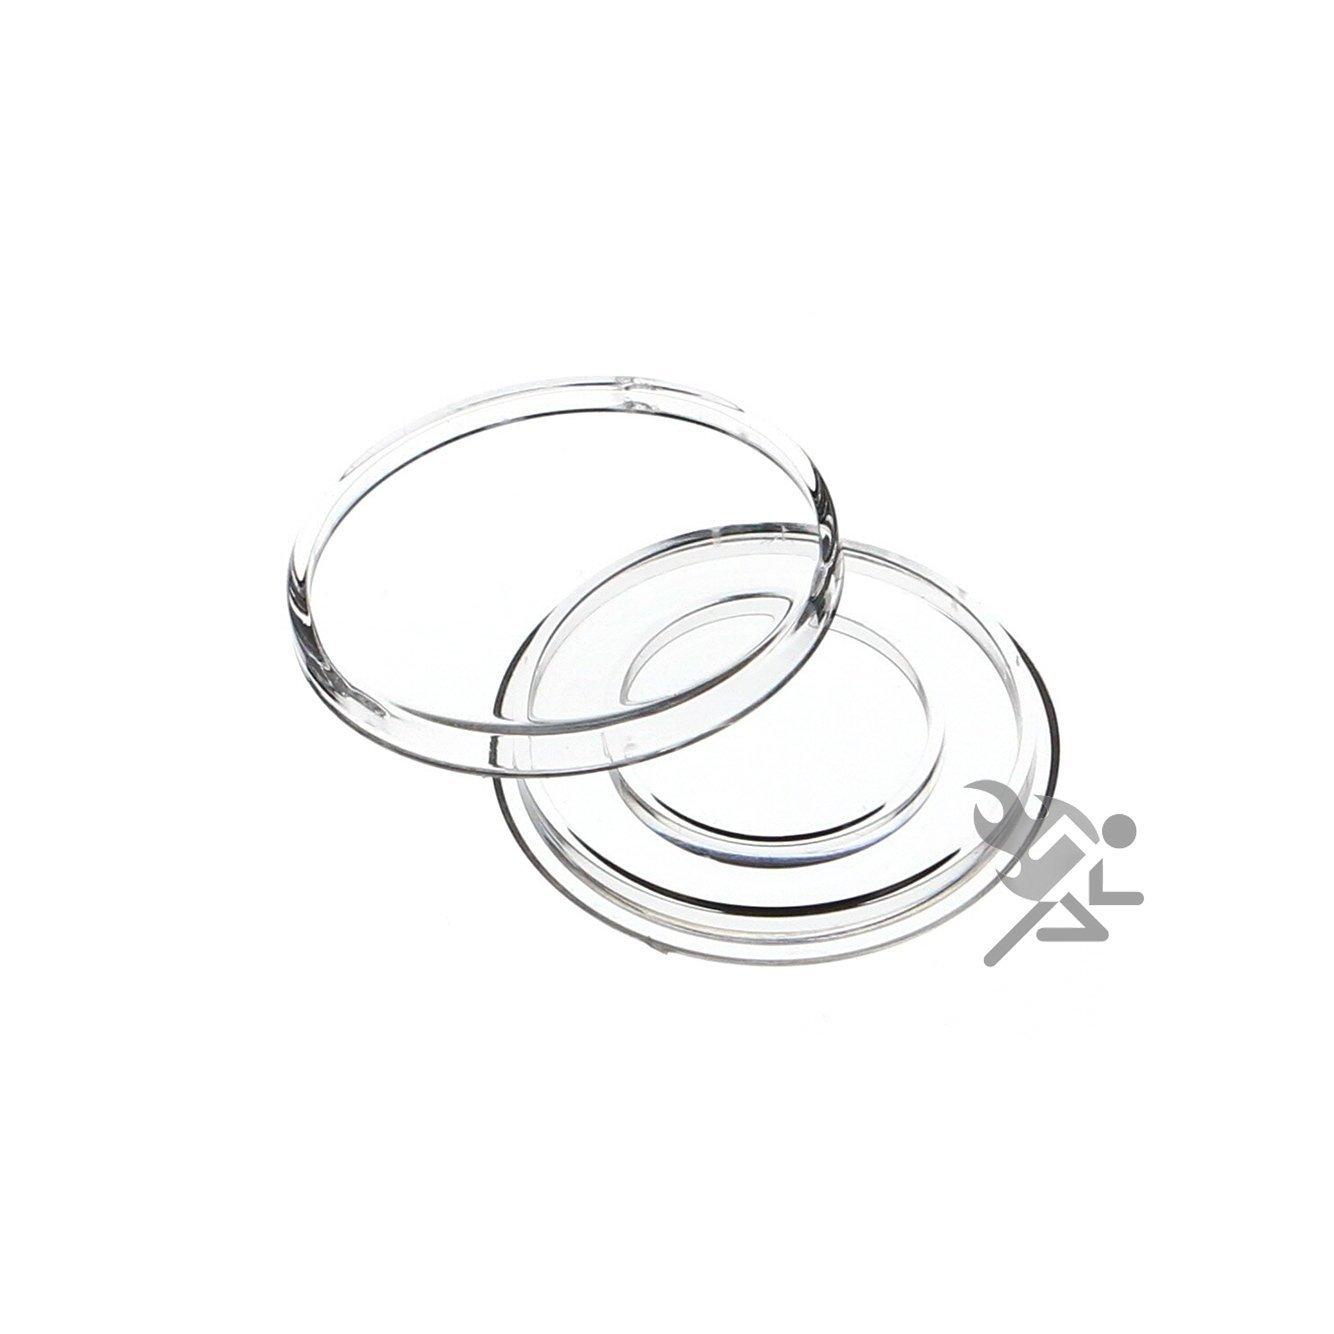 Black Capsule Tube /& 20 Air-Tite H27 Direct Fits 1//2oz Gold Eagle Coin Holder